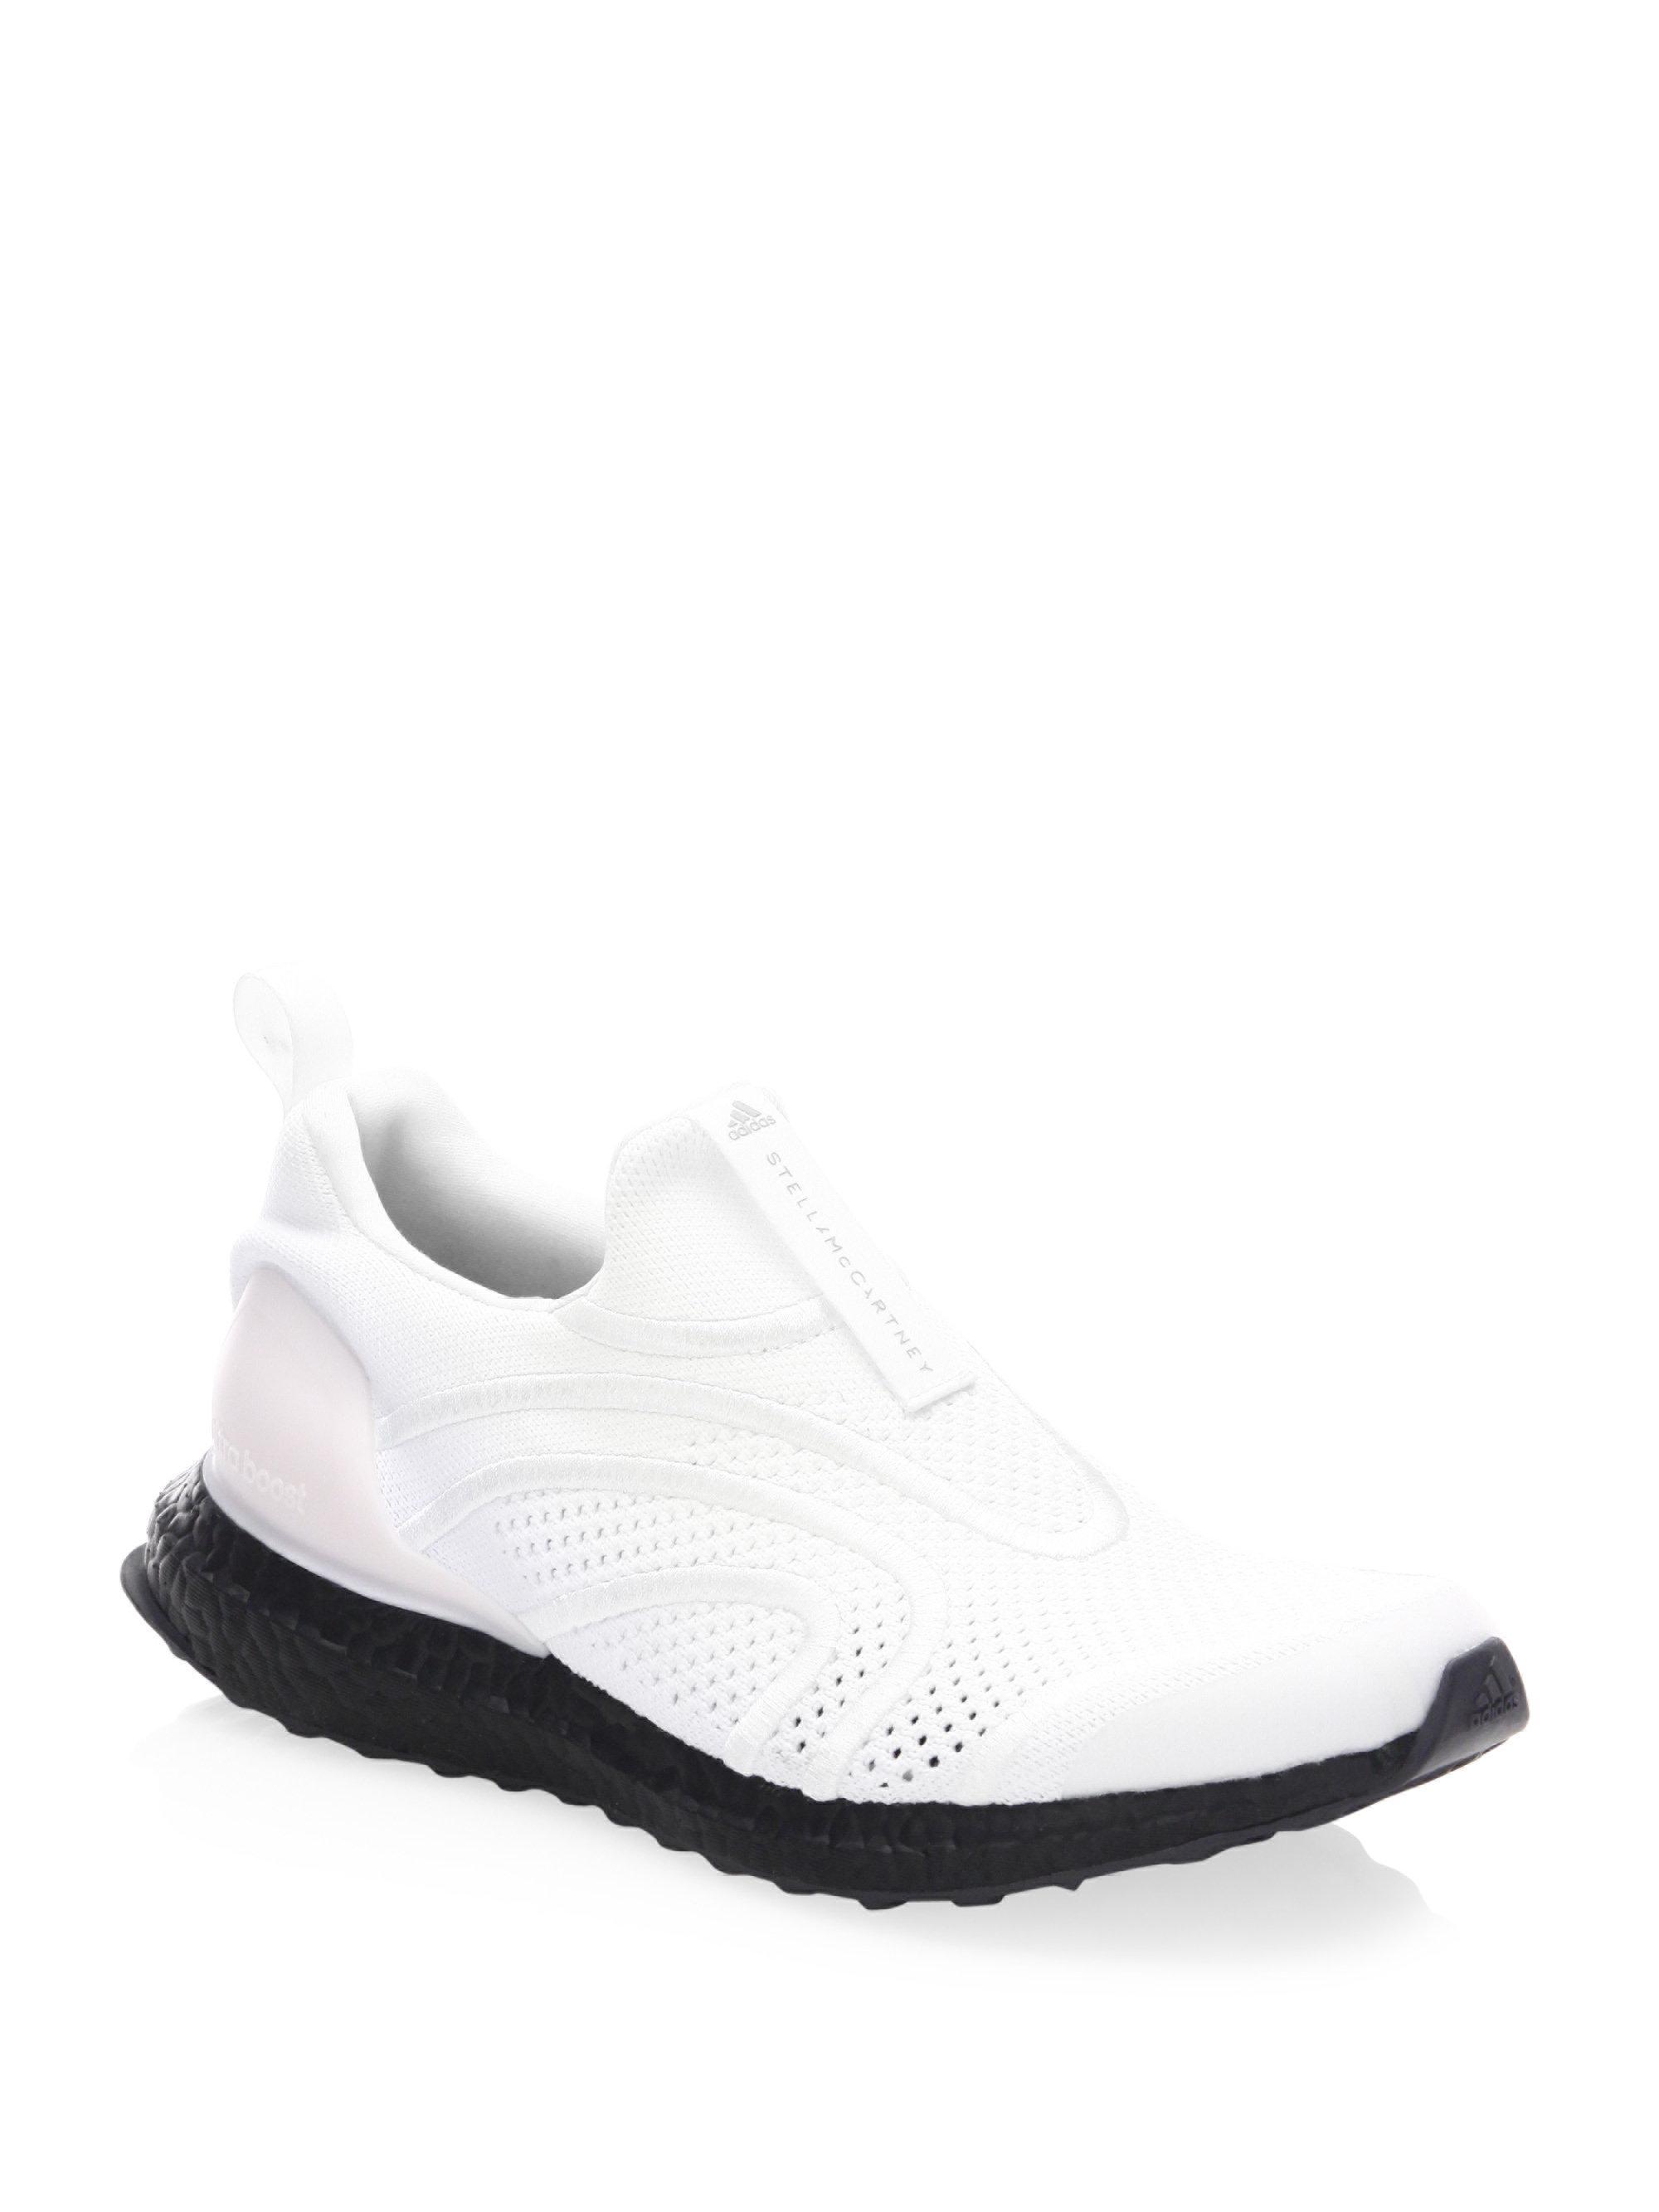 lyst adidas da stella mccartney ultraboost fece uscire le scarpe da ginnastica in bianco.